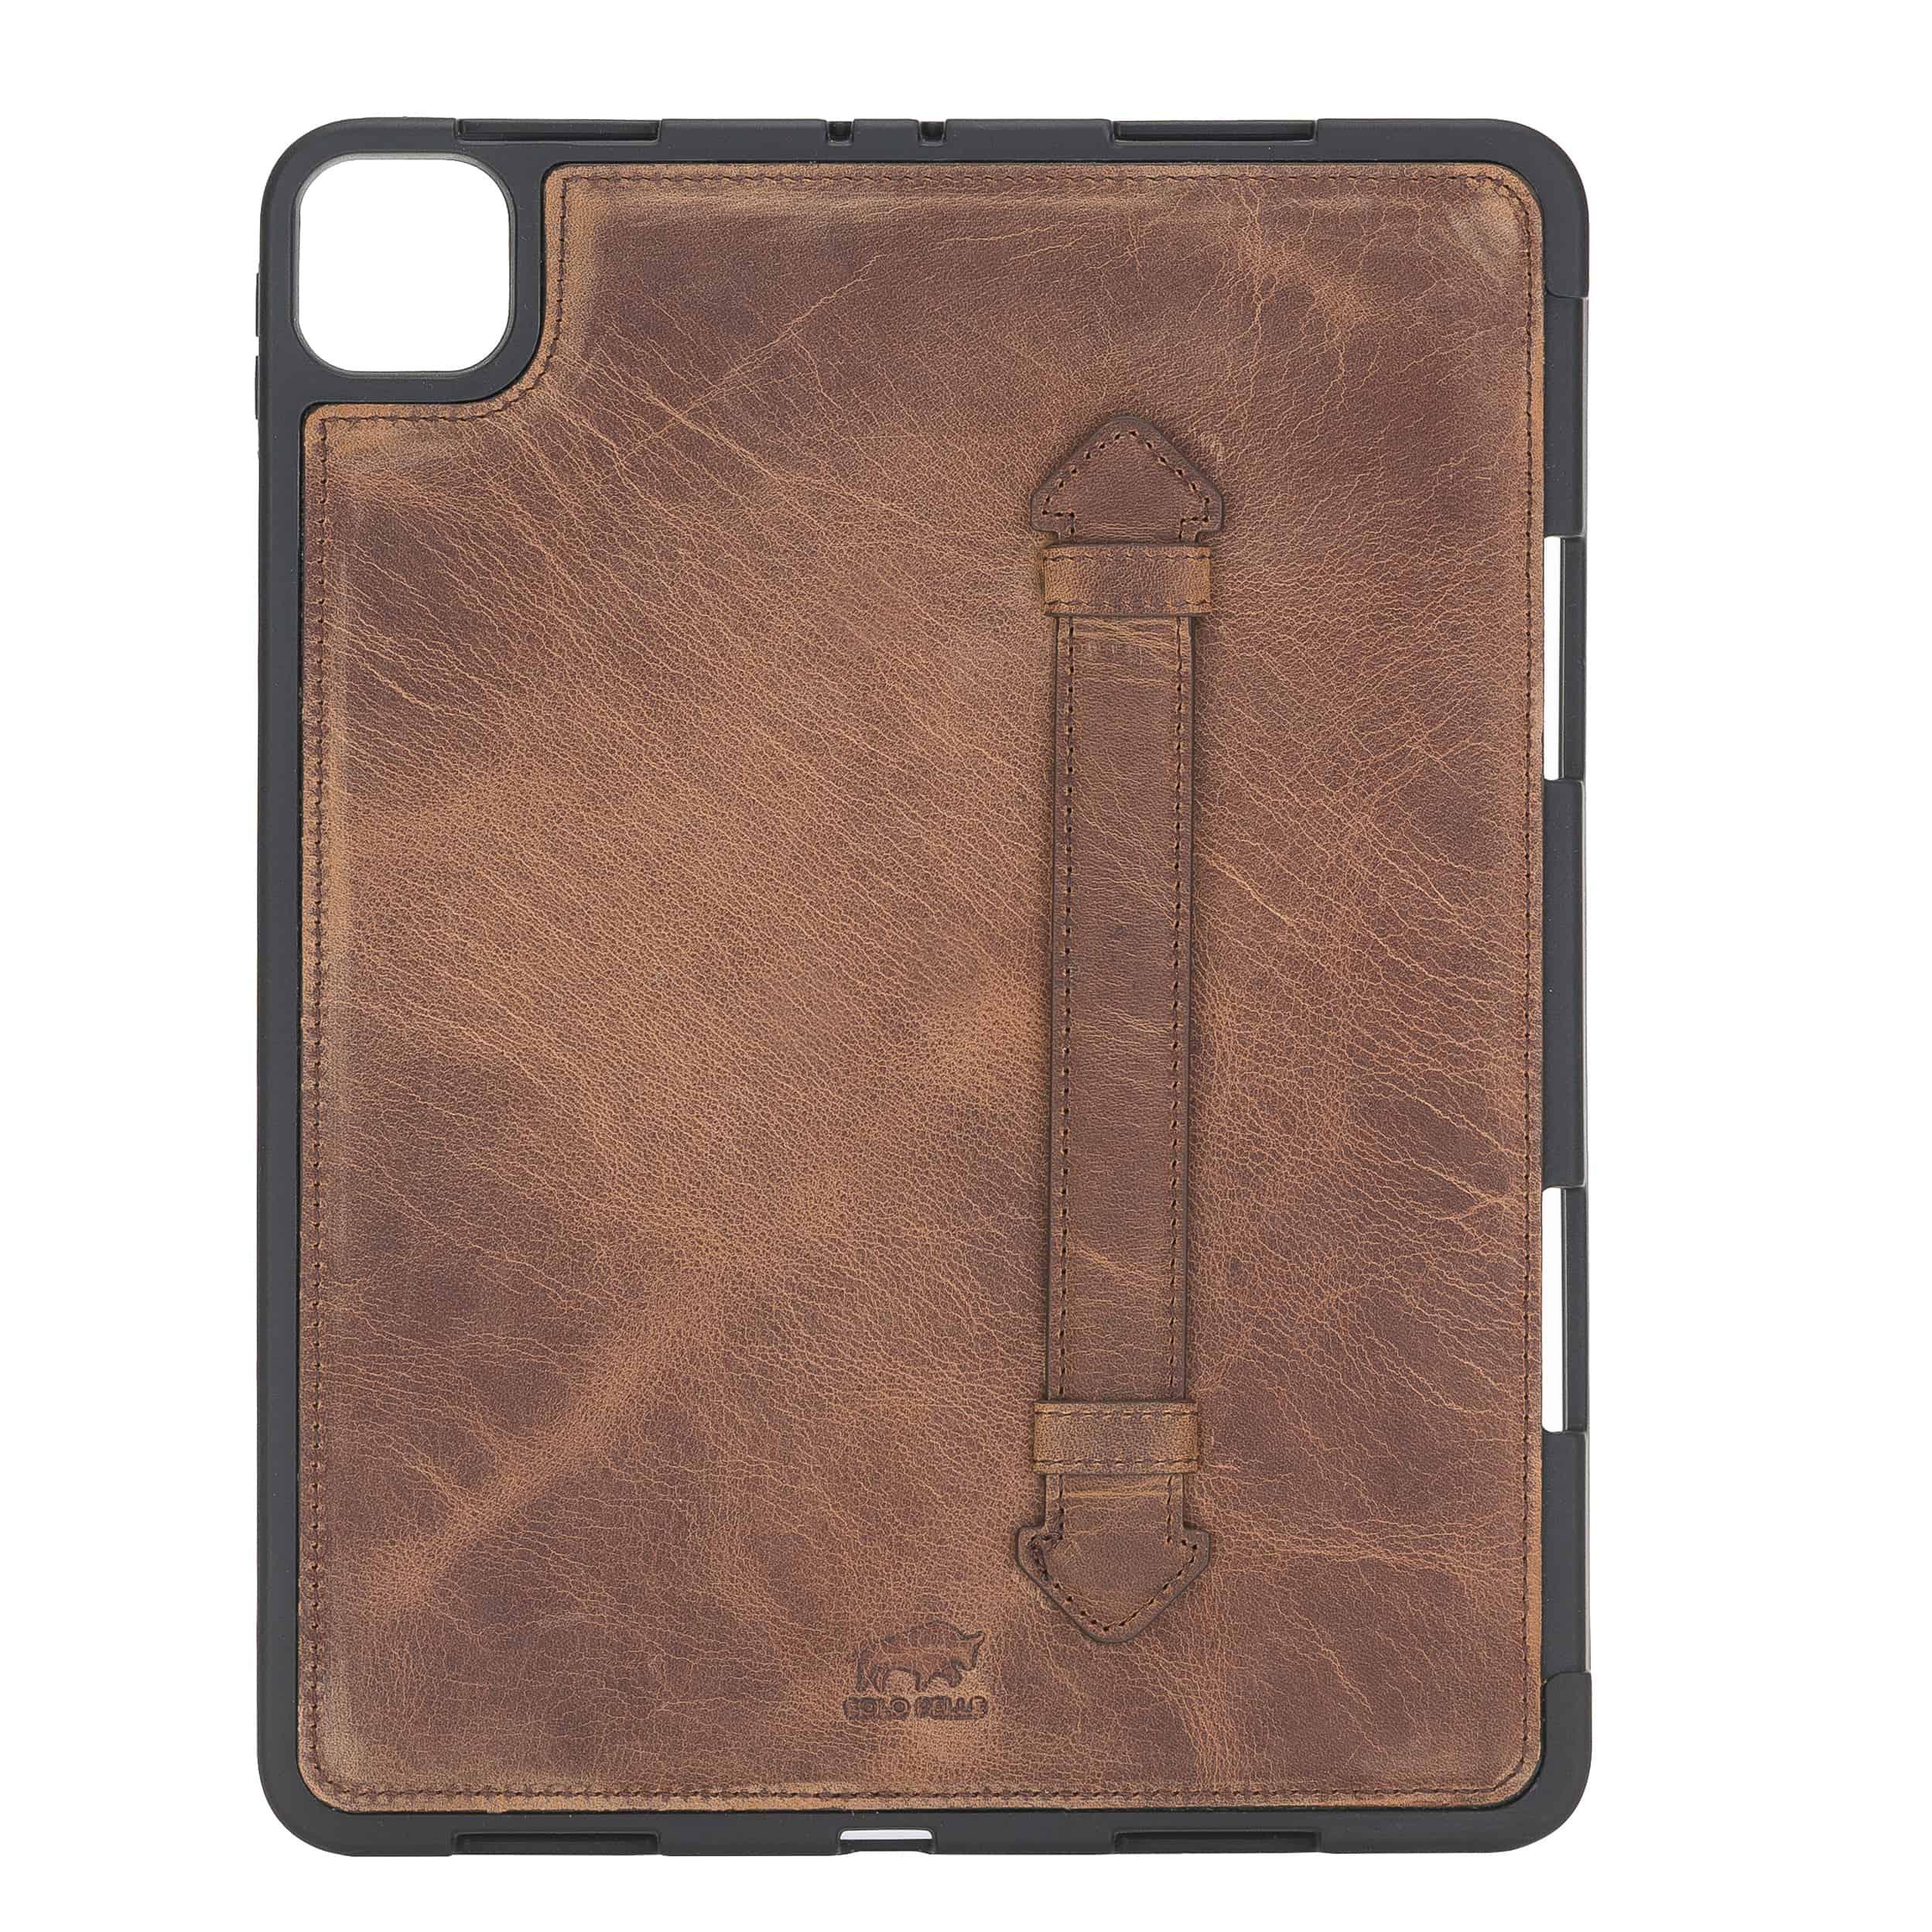 "Solo Pelle Hülle geeignet für Apple iPad Pro 11"" 2020 Echtleder Case aus echtem Leder. Unterstützt Pencil inkl. Ledergriff (Vintage Braun)"